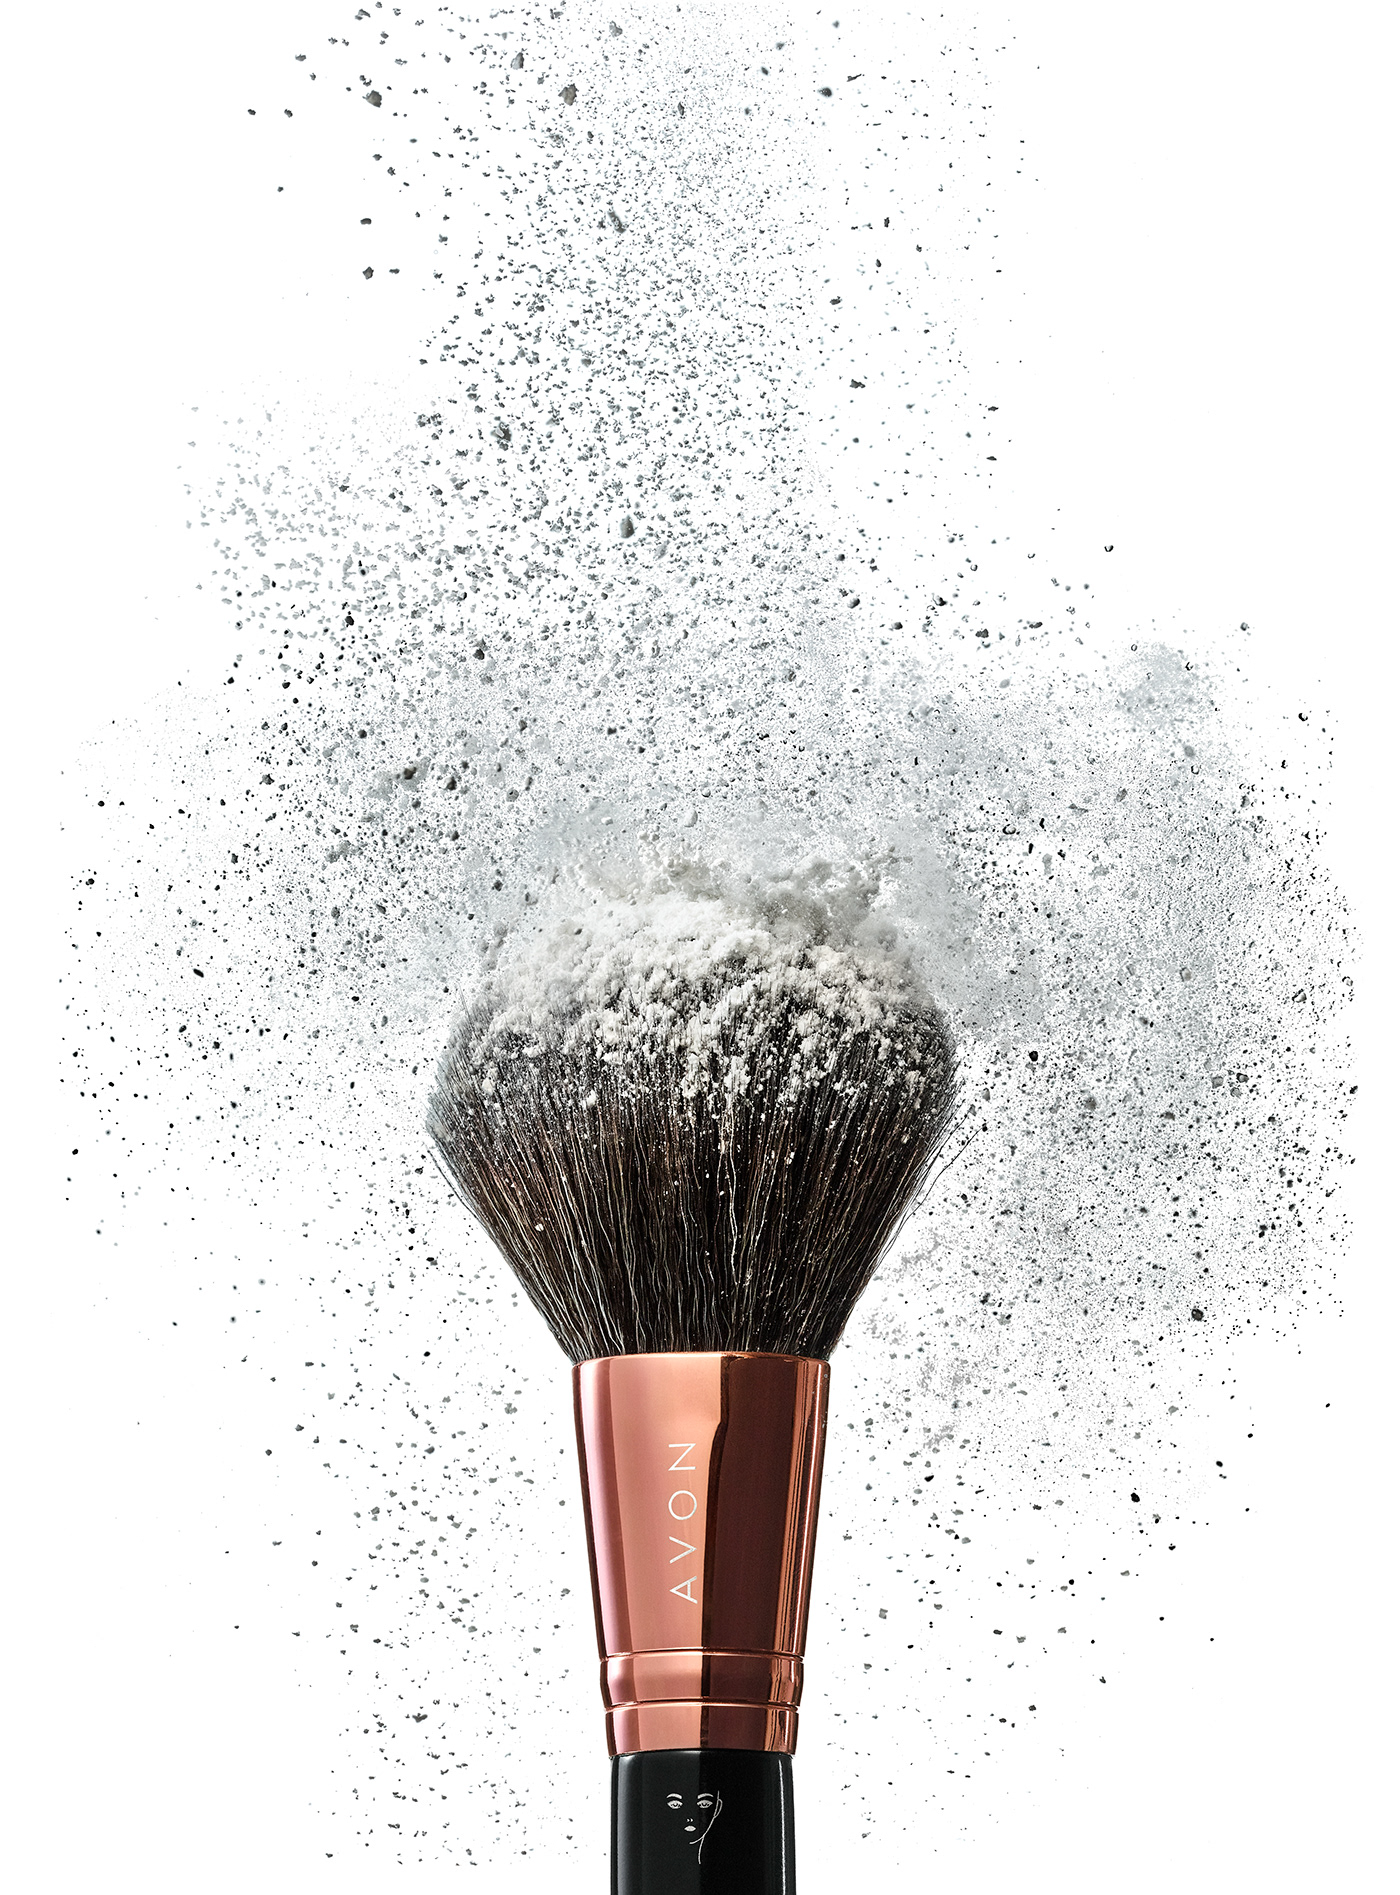 Image may contain: brush